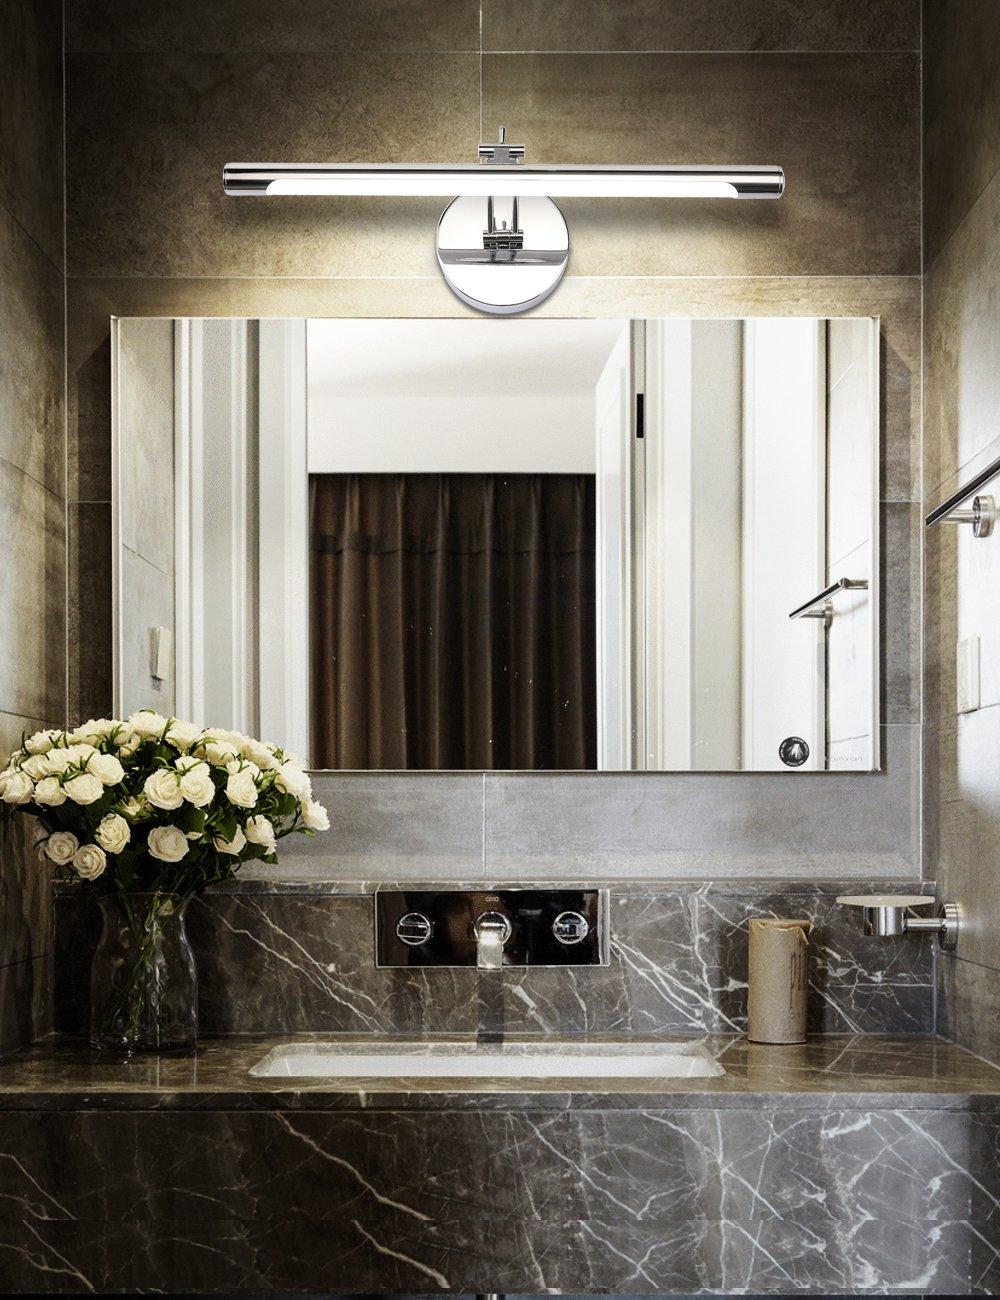 Solfart led stainless steel bathroom vanity light fixtures - Bathroom led light fixtures over mirror ...